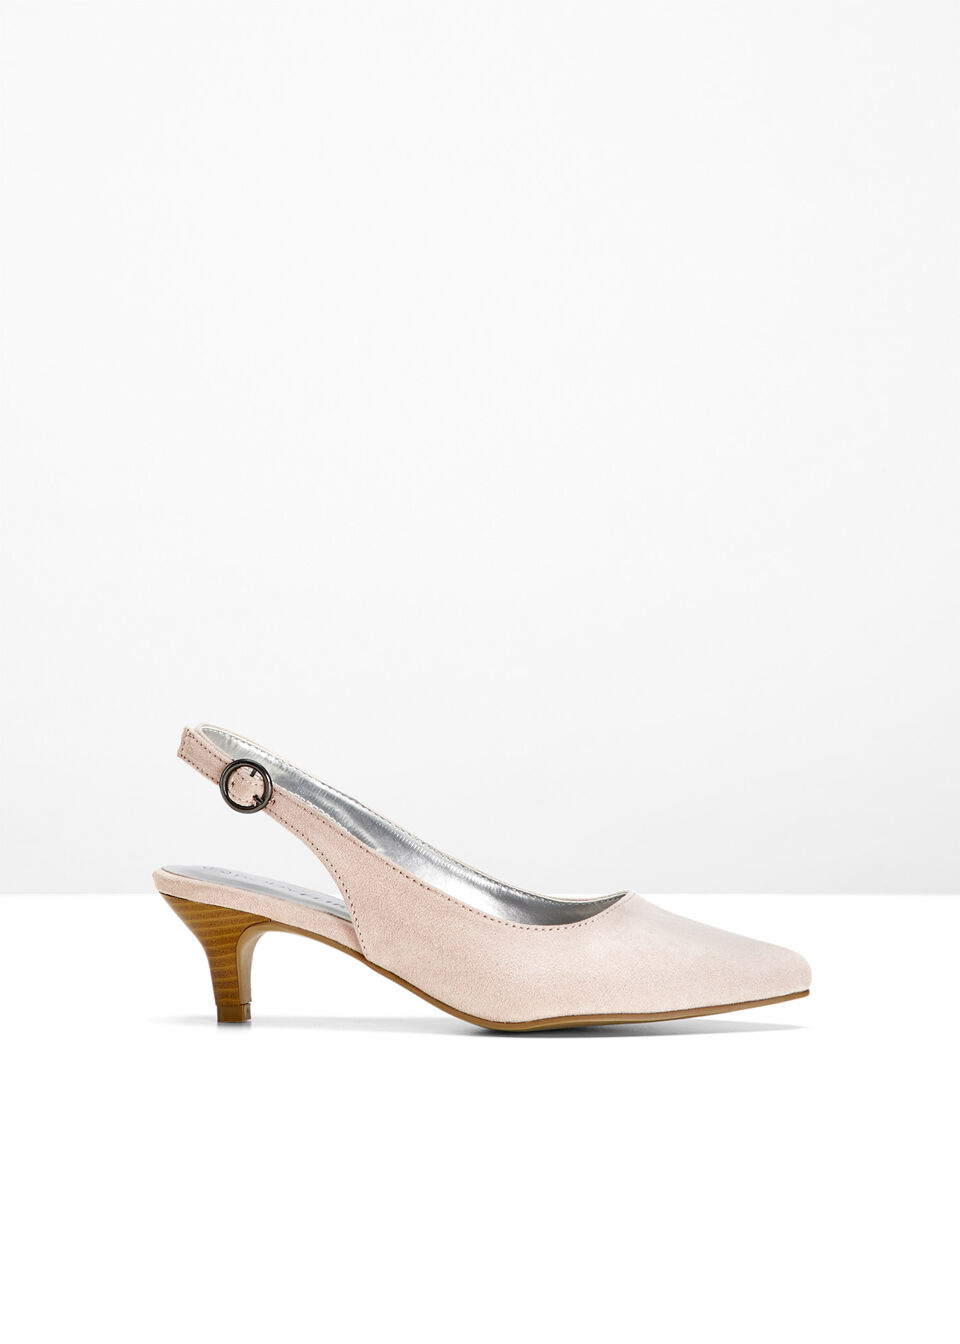 Туфли-лодочки с открытой пяткой от bonprix